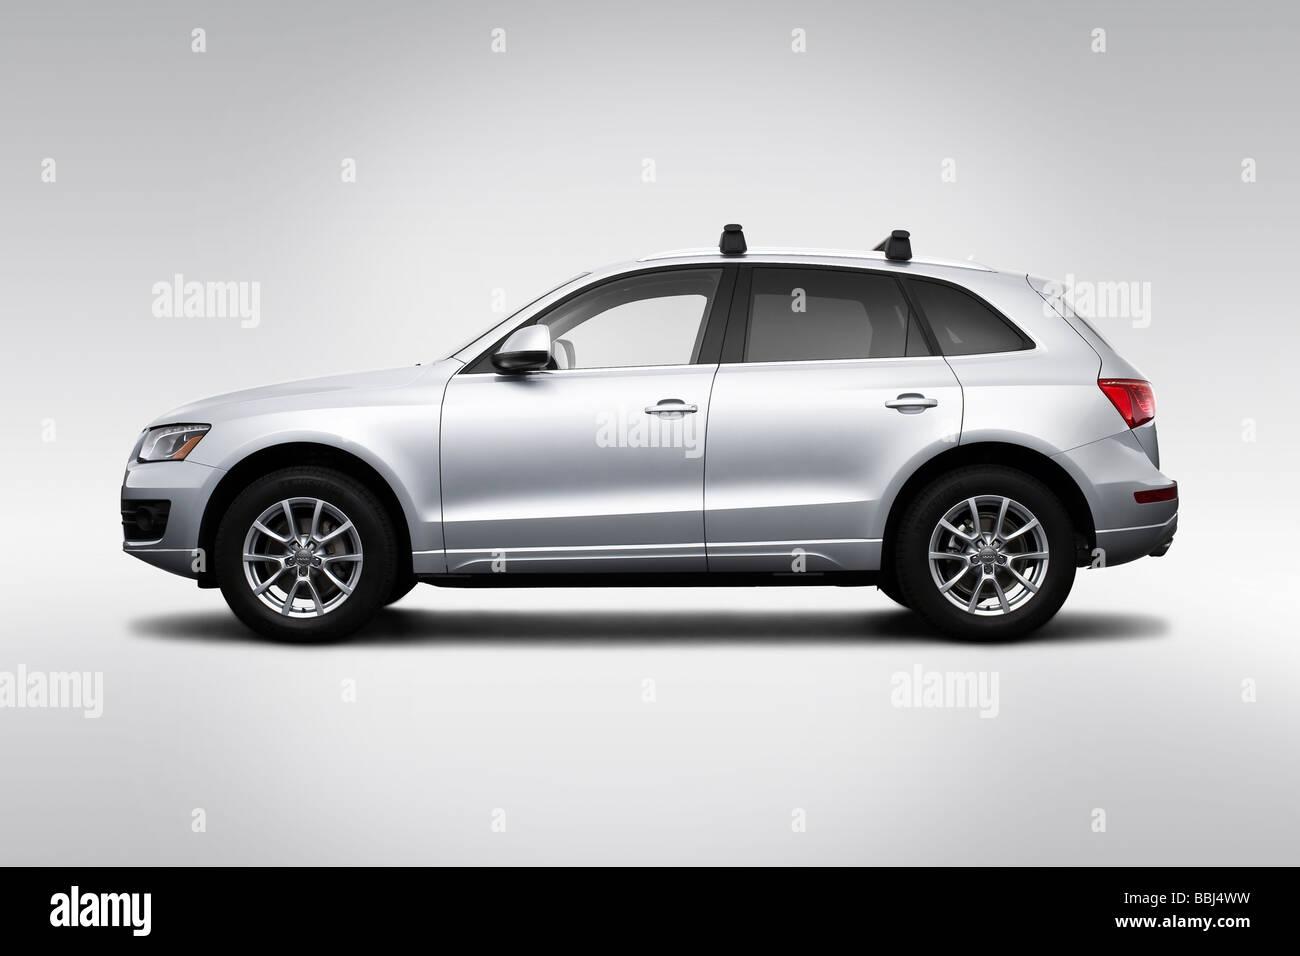 Kelebihan Audi Q5 2009 Top Model Tahun Ini